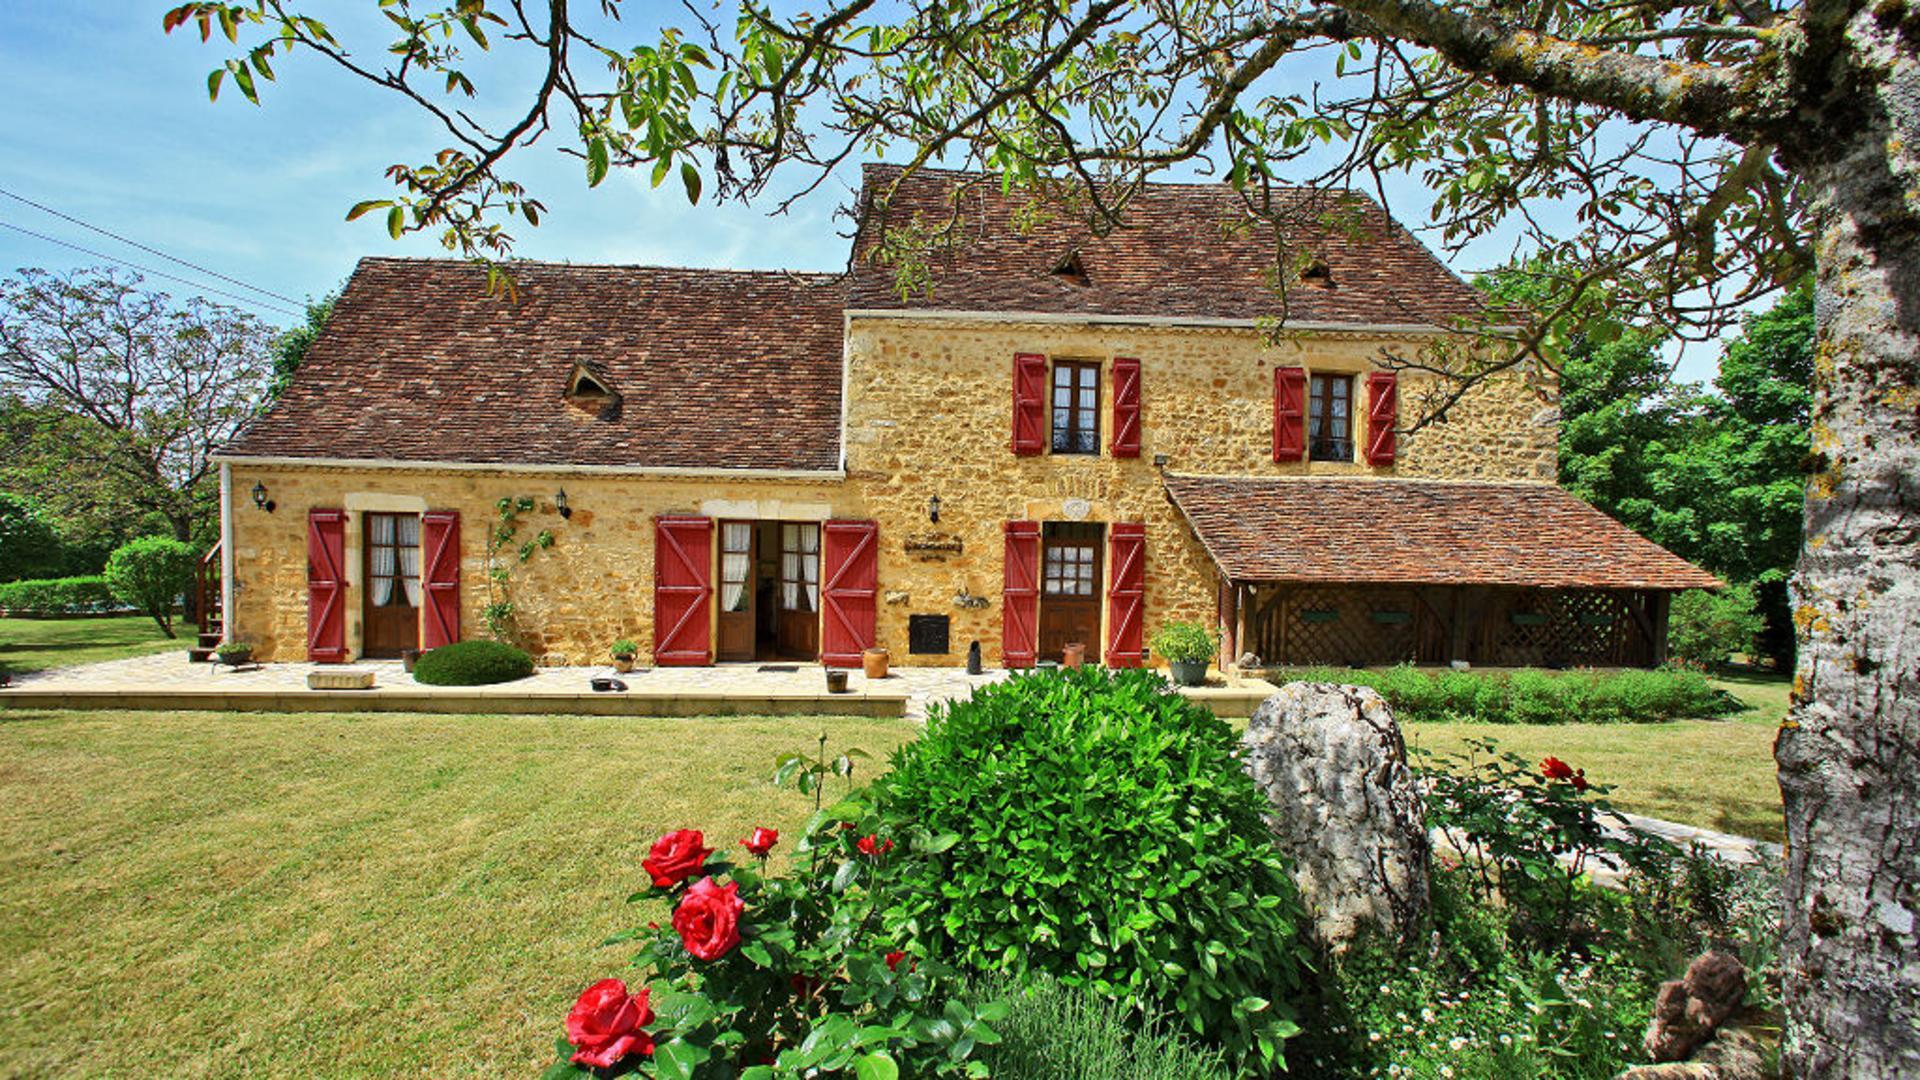 Villa exterior, Belle du Perigold, Dordogne, Nadaillac  De Rouge.